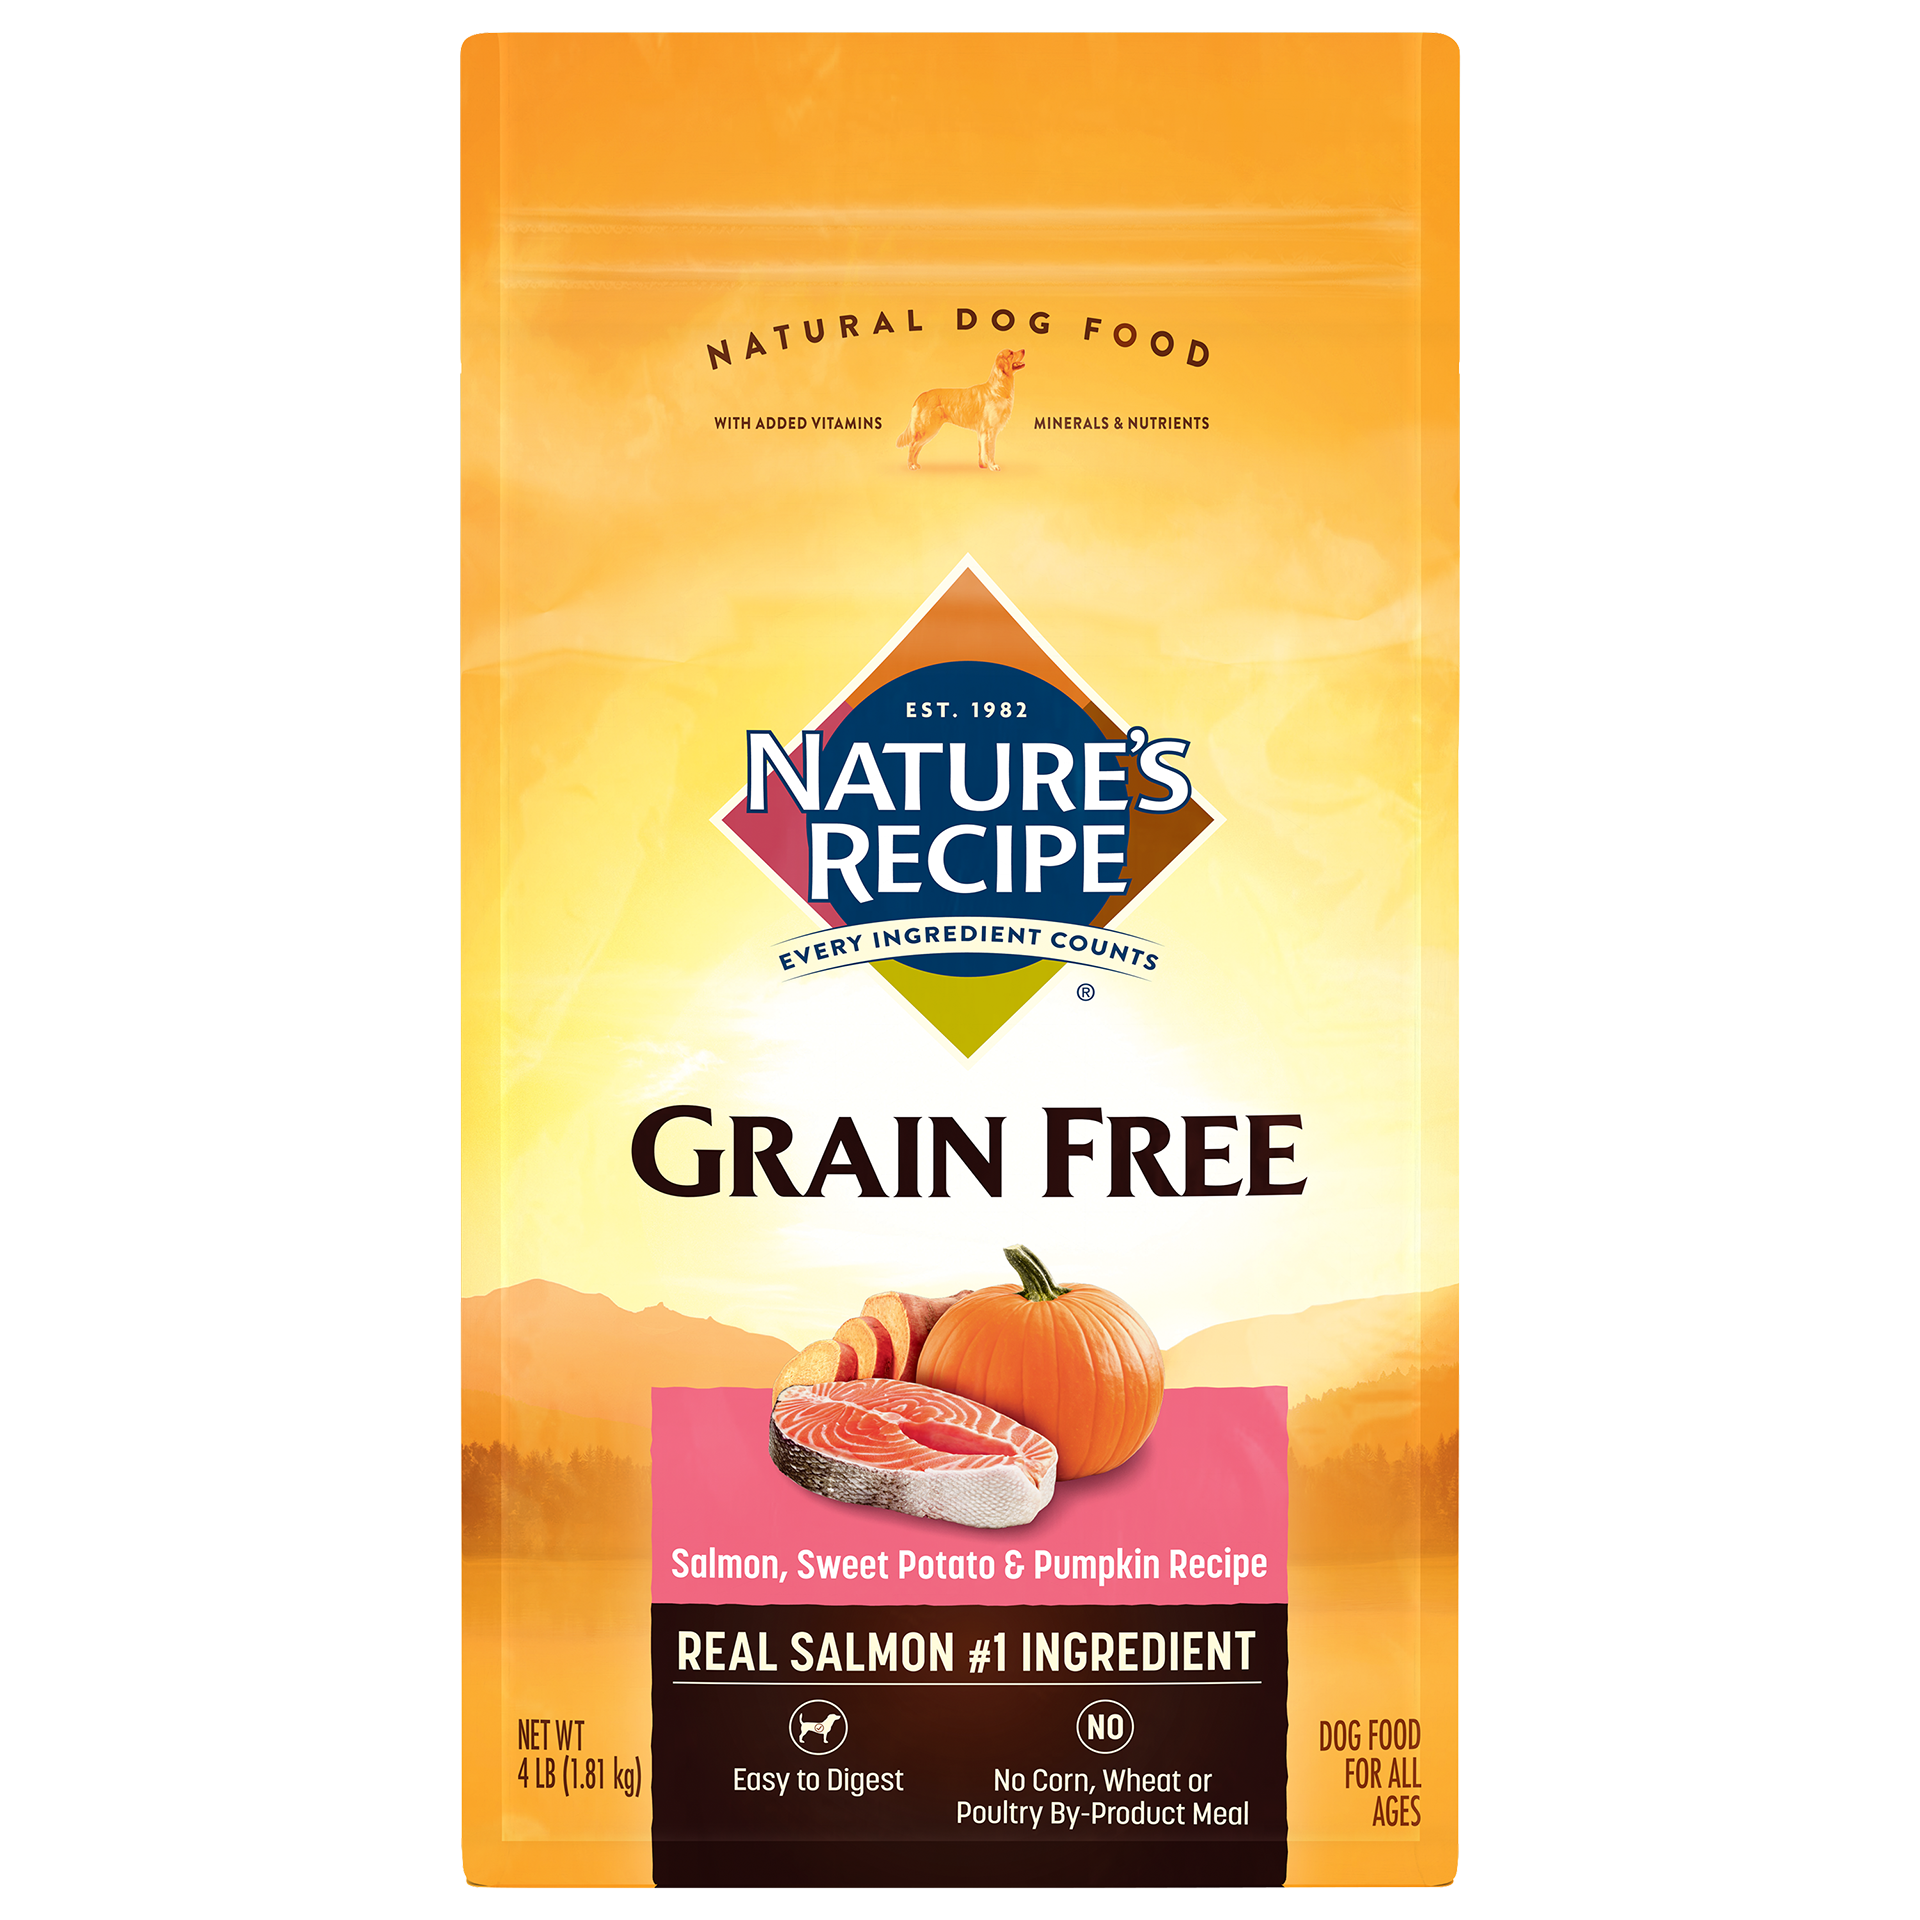 Grain Free Easy to Digest Salmon, Sweet Potato, & Pumpkin Recipe